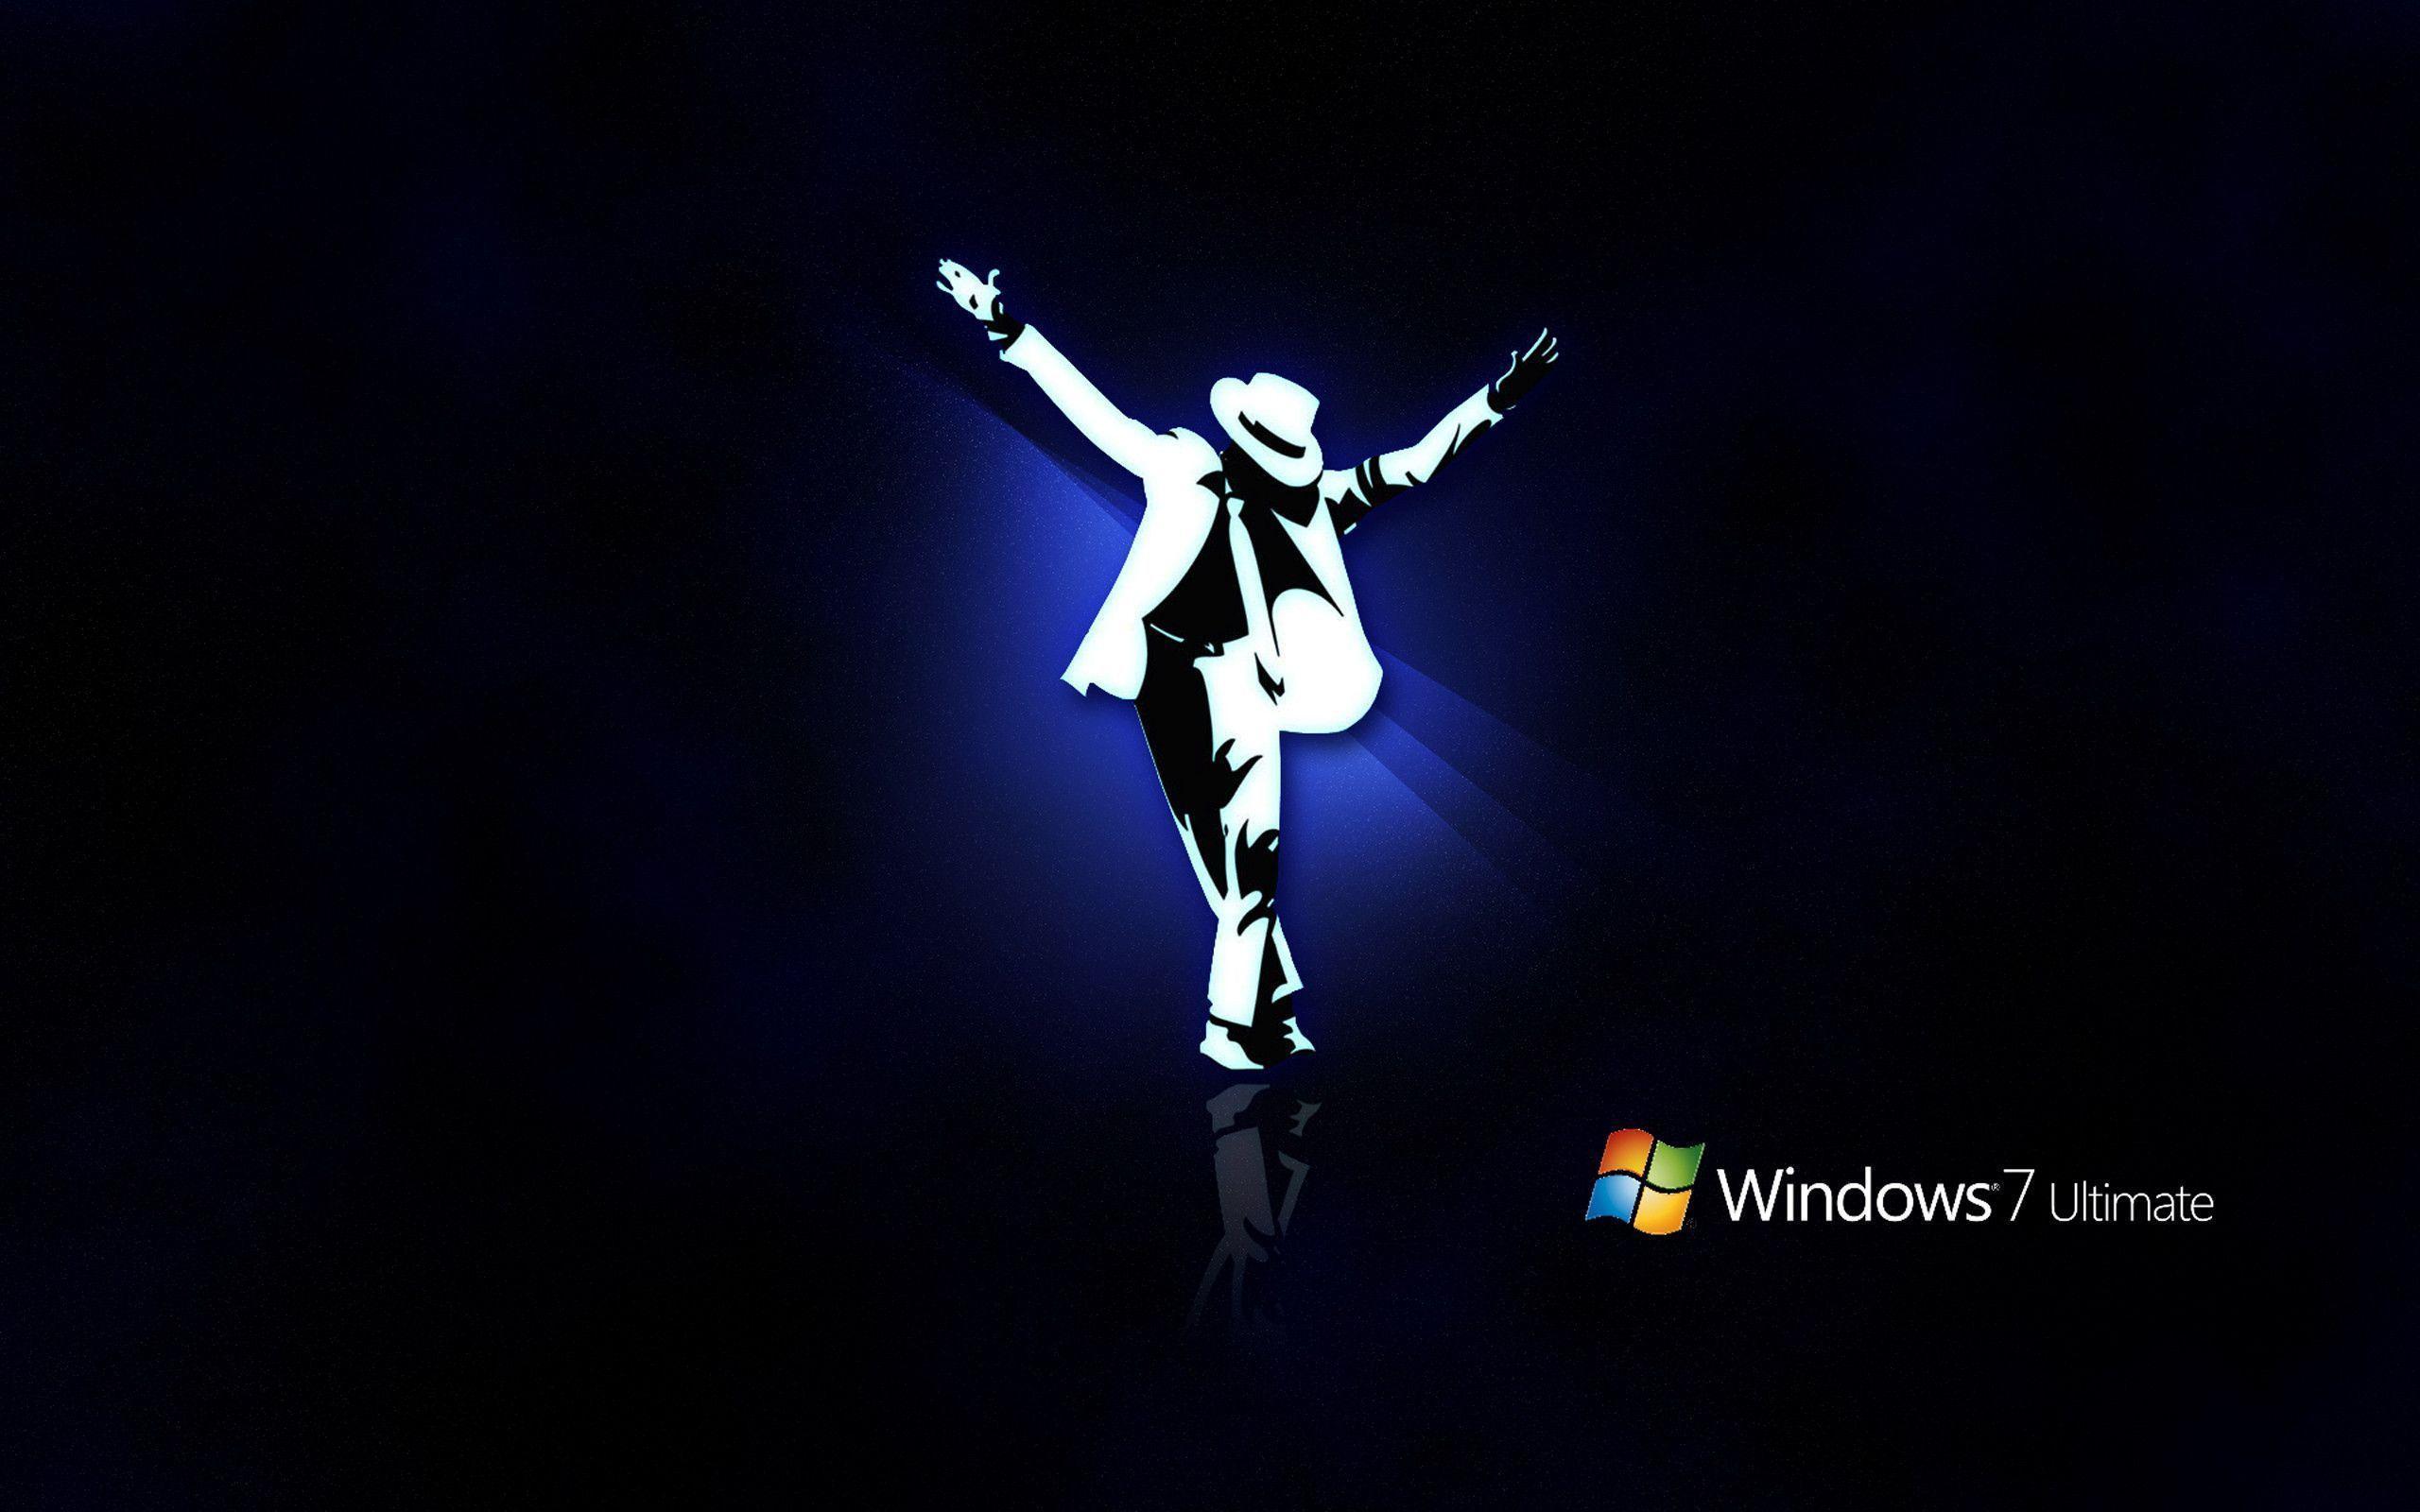 animated desktop backgrounds windows - photo #33